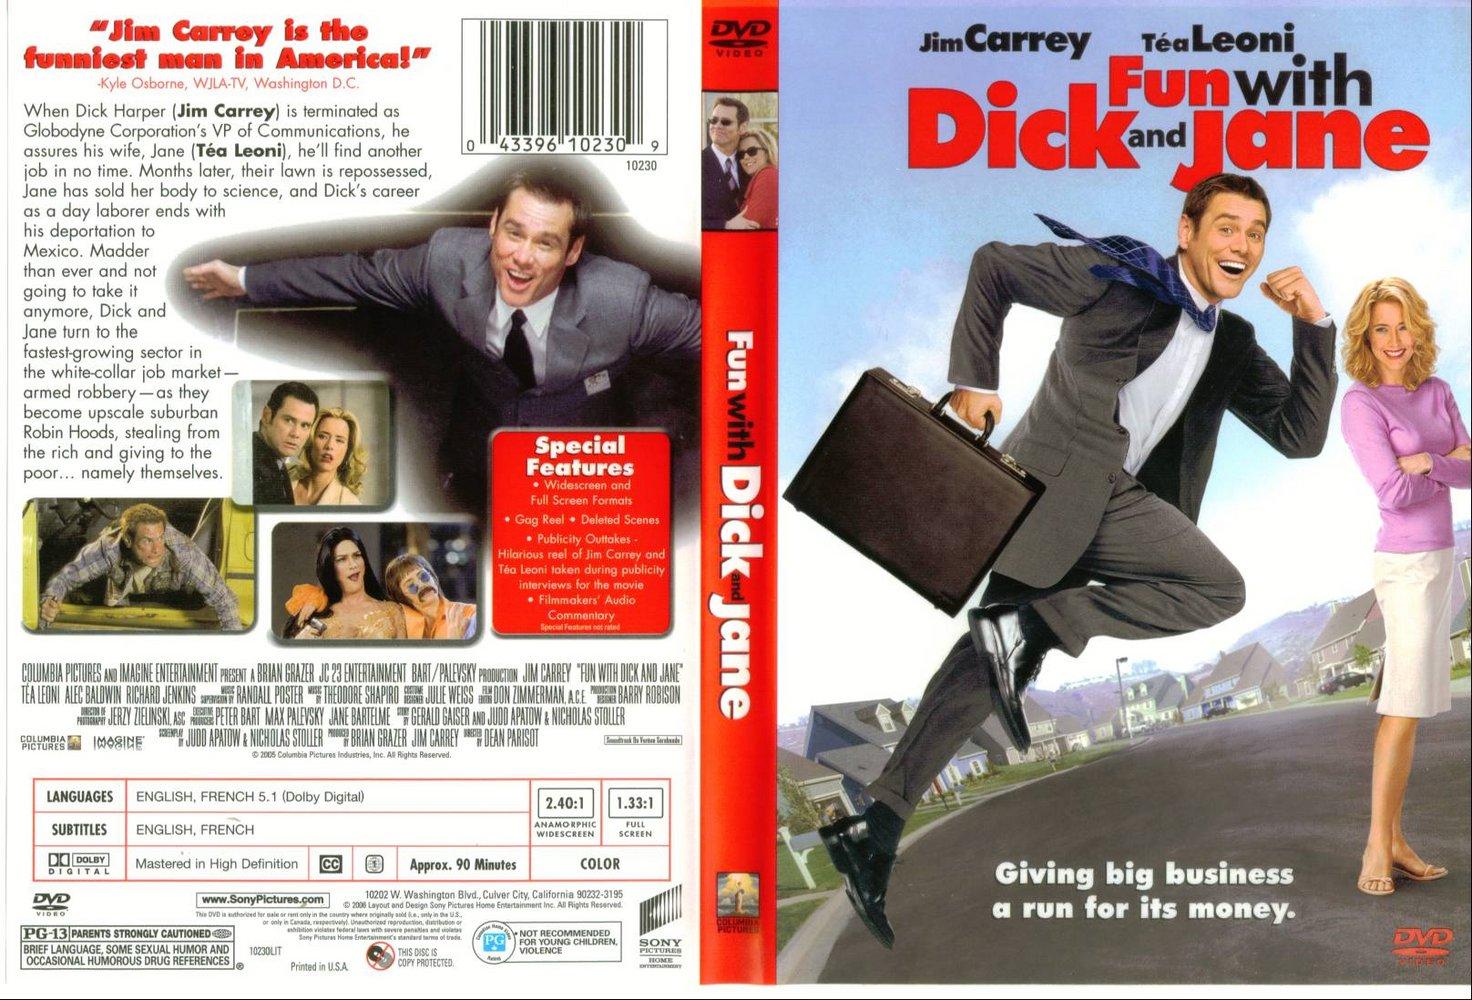 http://4.bp.blogspot.com/_gRRlB9YQM4k/TE8pHwWPaJI/AAAAAAAAAMM/2ho60nDT8XQ/s1600/Fun_With_Dick_And_Jane-%5Bcdcovers_cc%5D-front.jpg